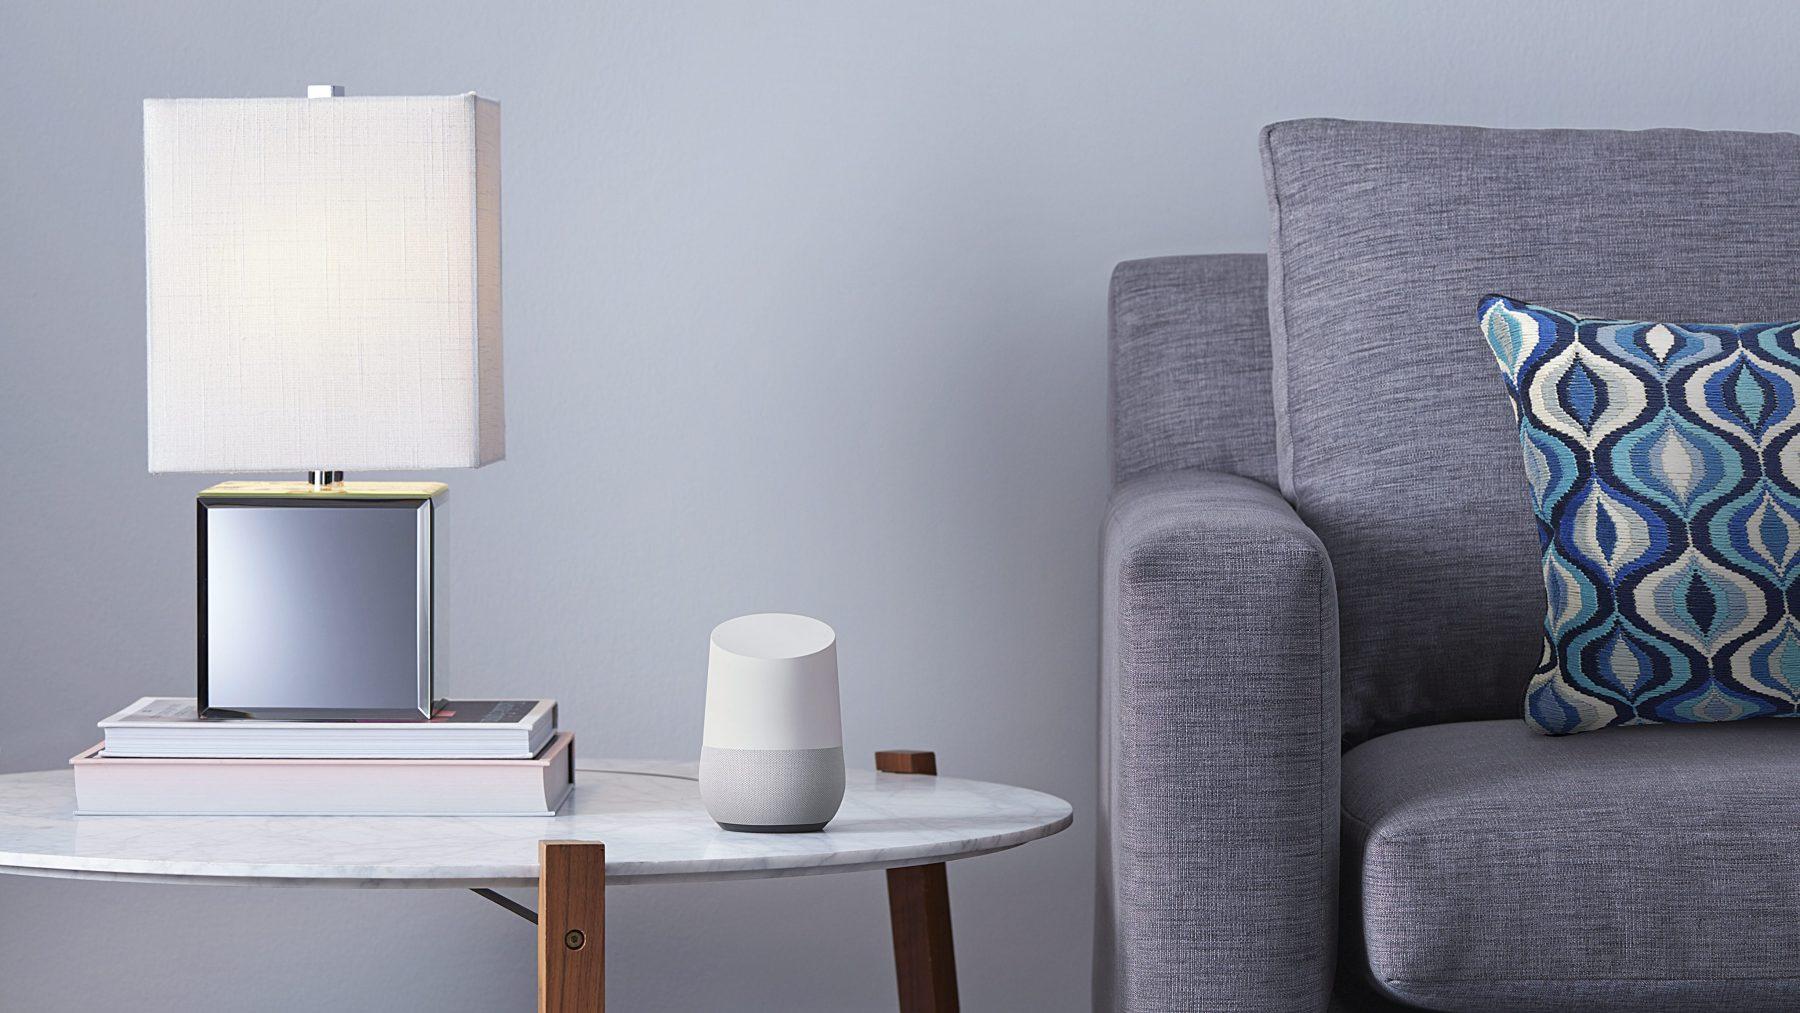 Google luistert Nederlandse gesprekken af met slimme apparaten